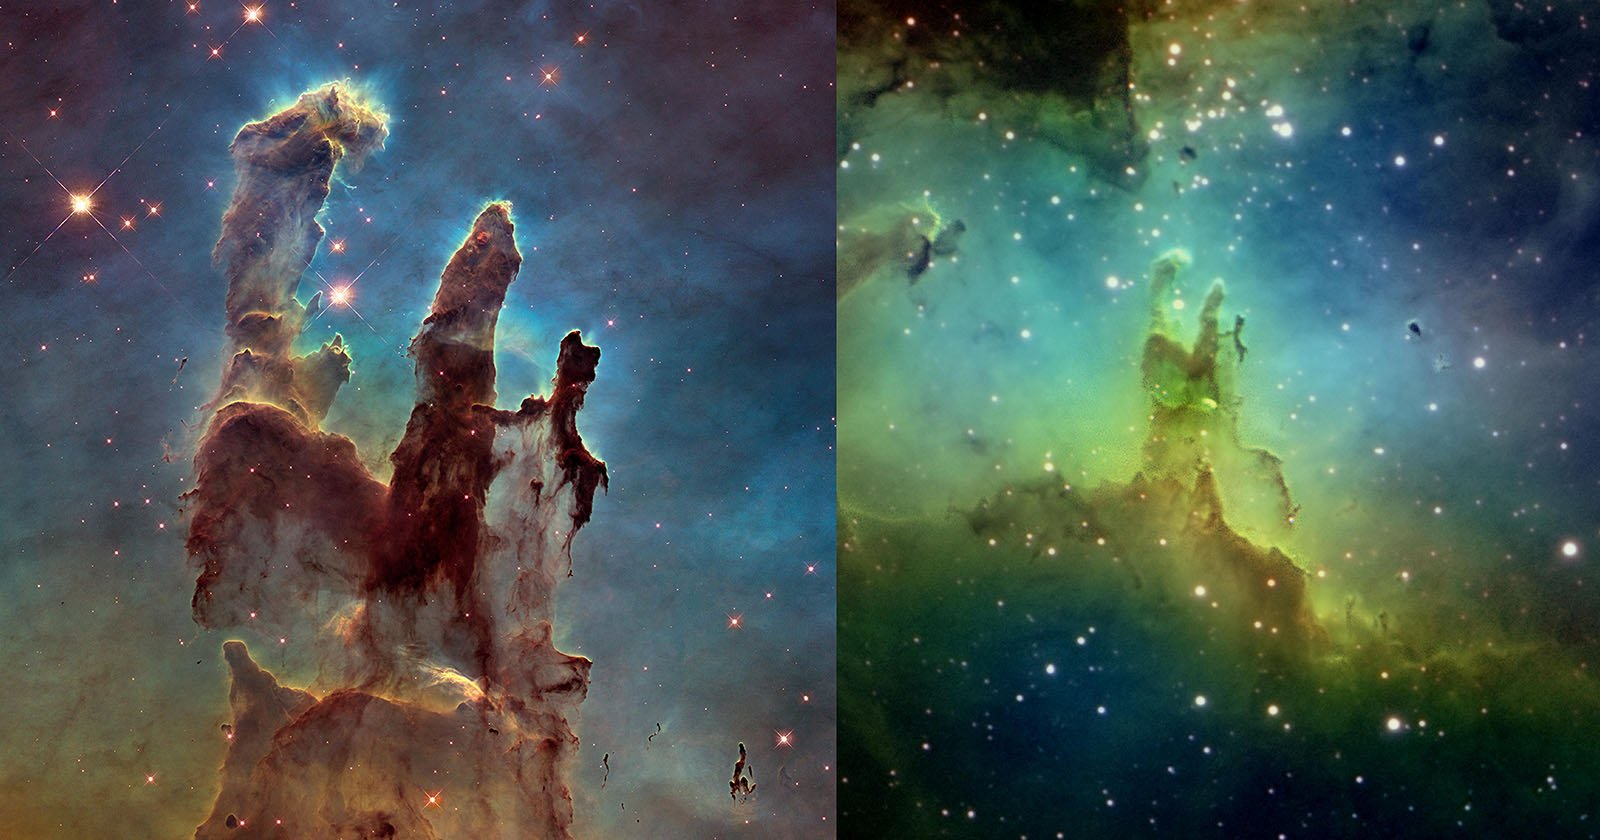 'Pillars of Creation' Photos: NASA vs. a Backyard Photographer